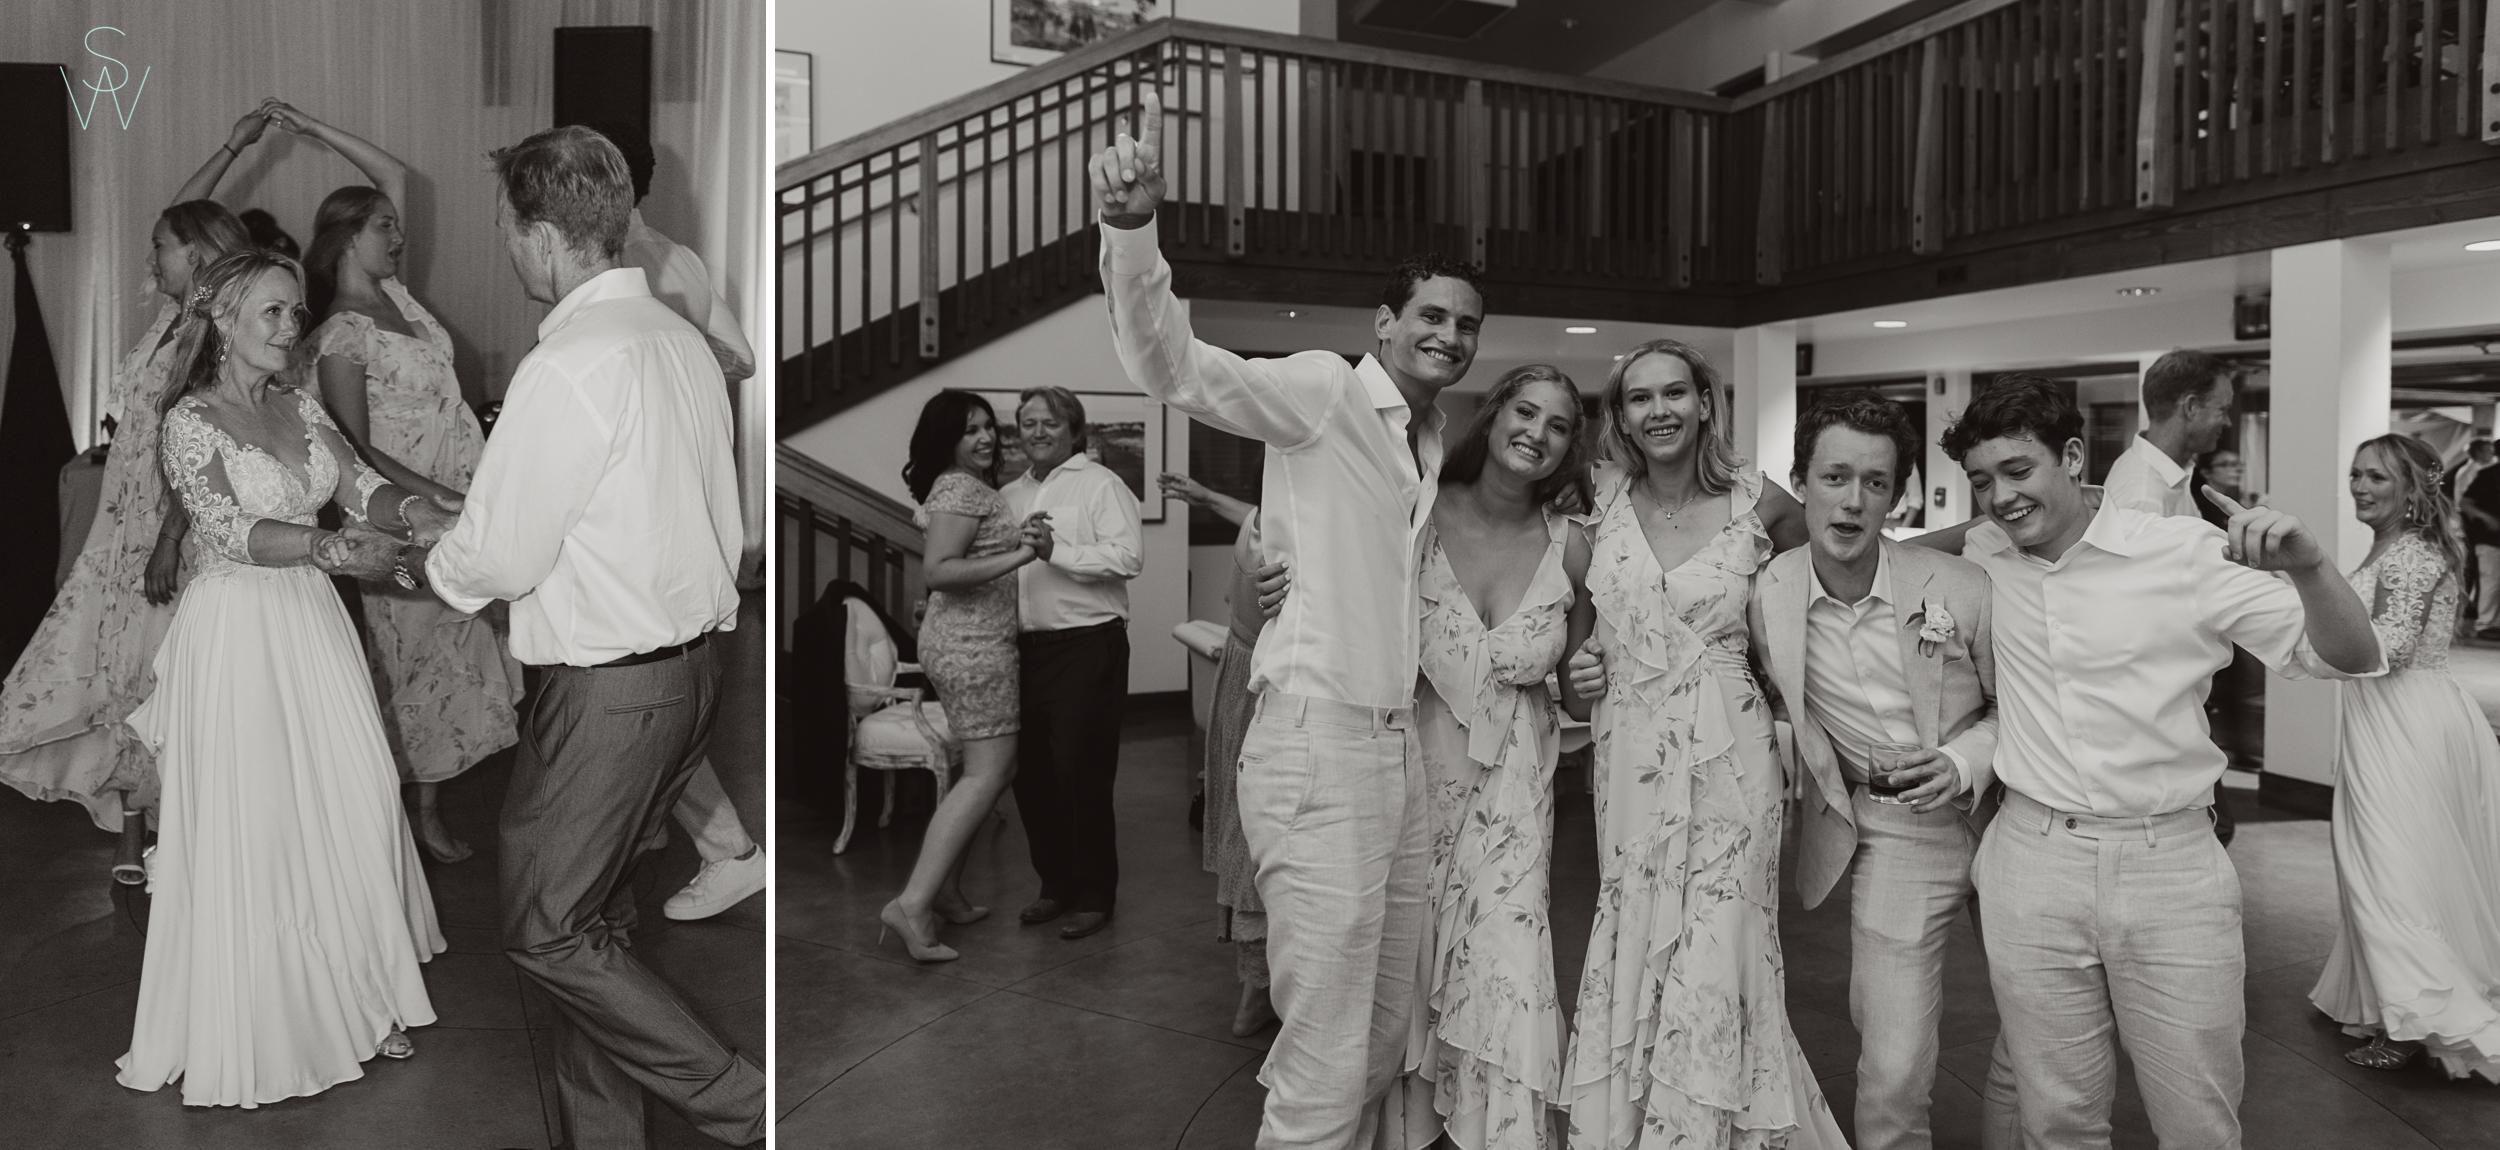 169DEL.MAR.WEDDINGS.photography.shewanders.JPG